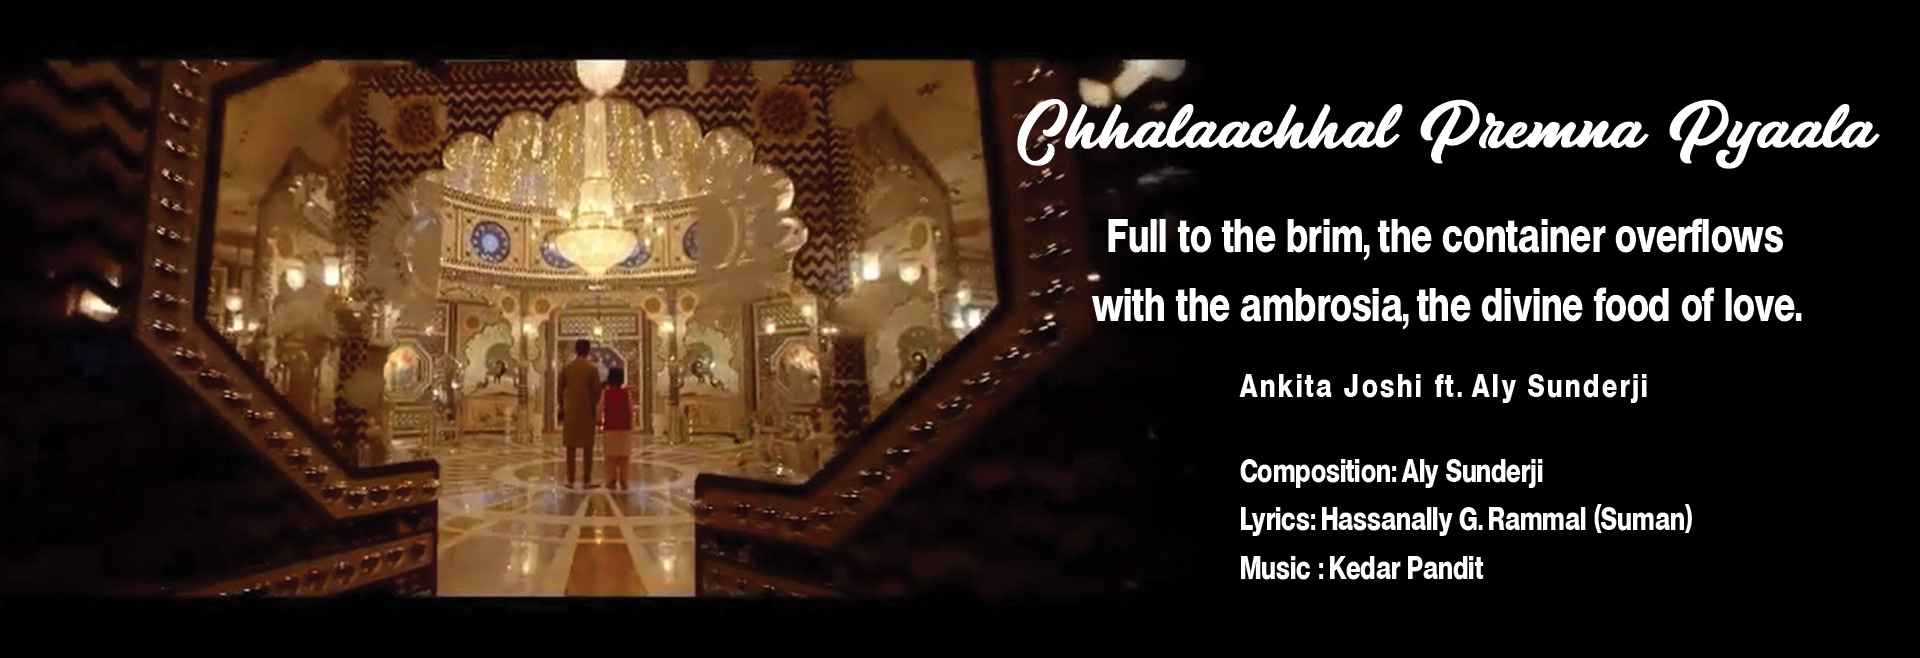 Chhalaachhal Slide